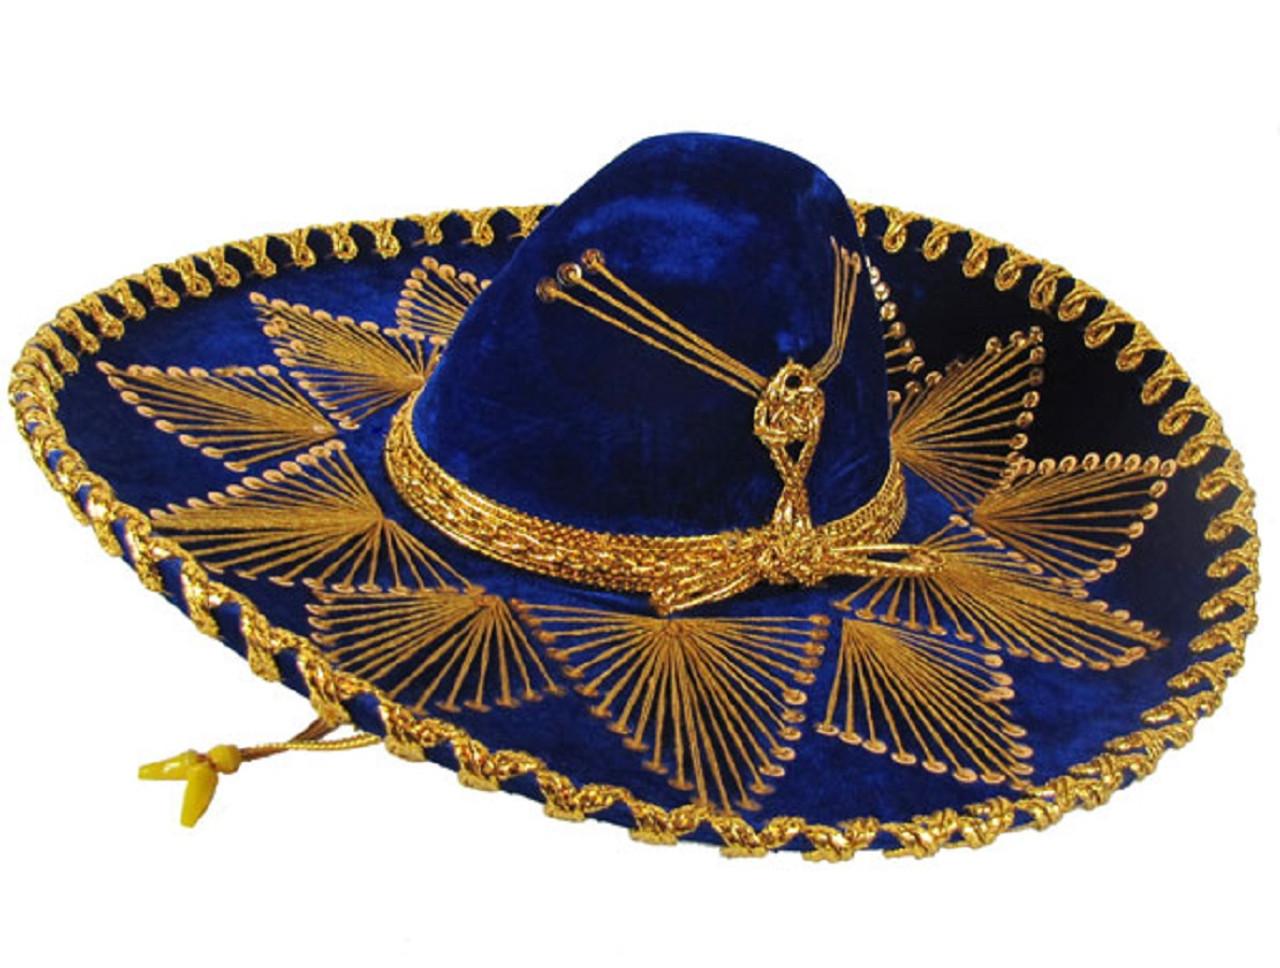 gran selección de 2019 mejor servicio descuento Sombrero Classic Velvet Fine Assorted Large 23